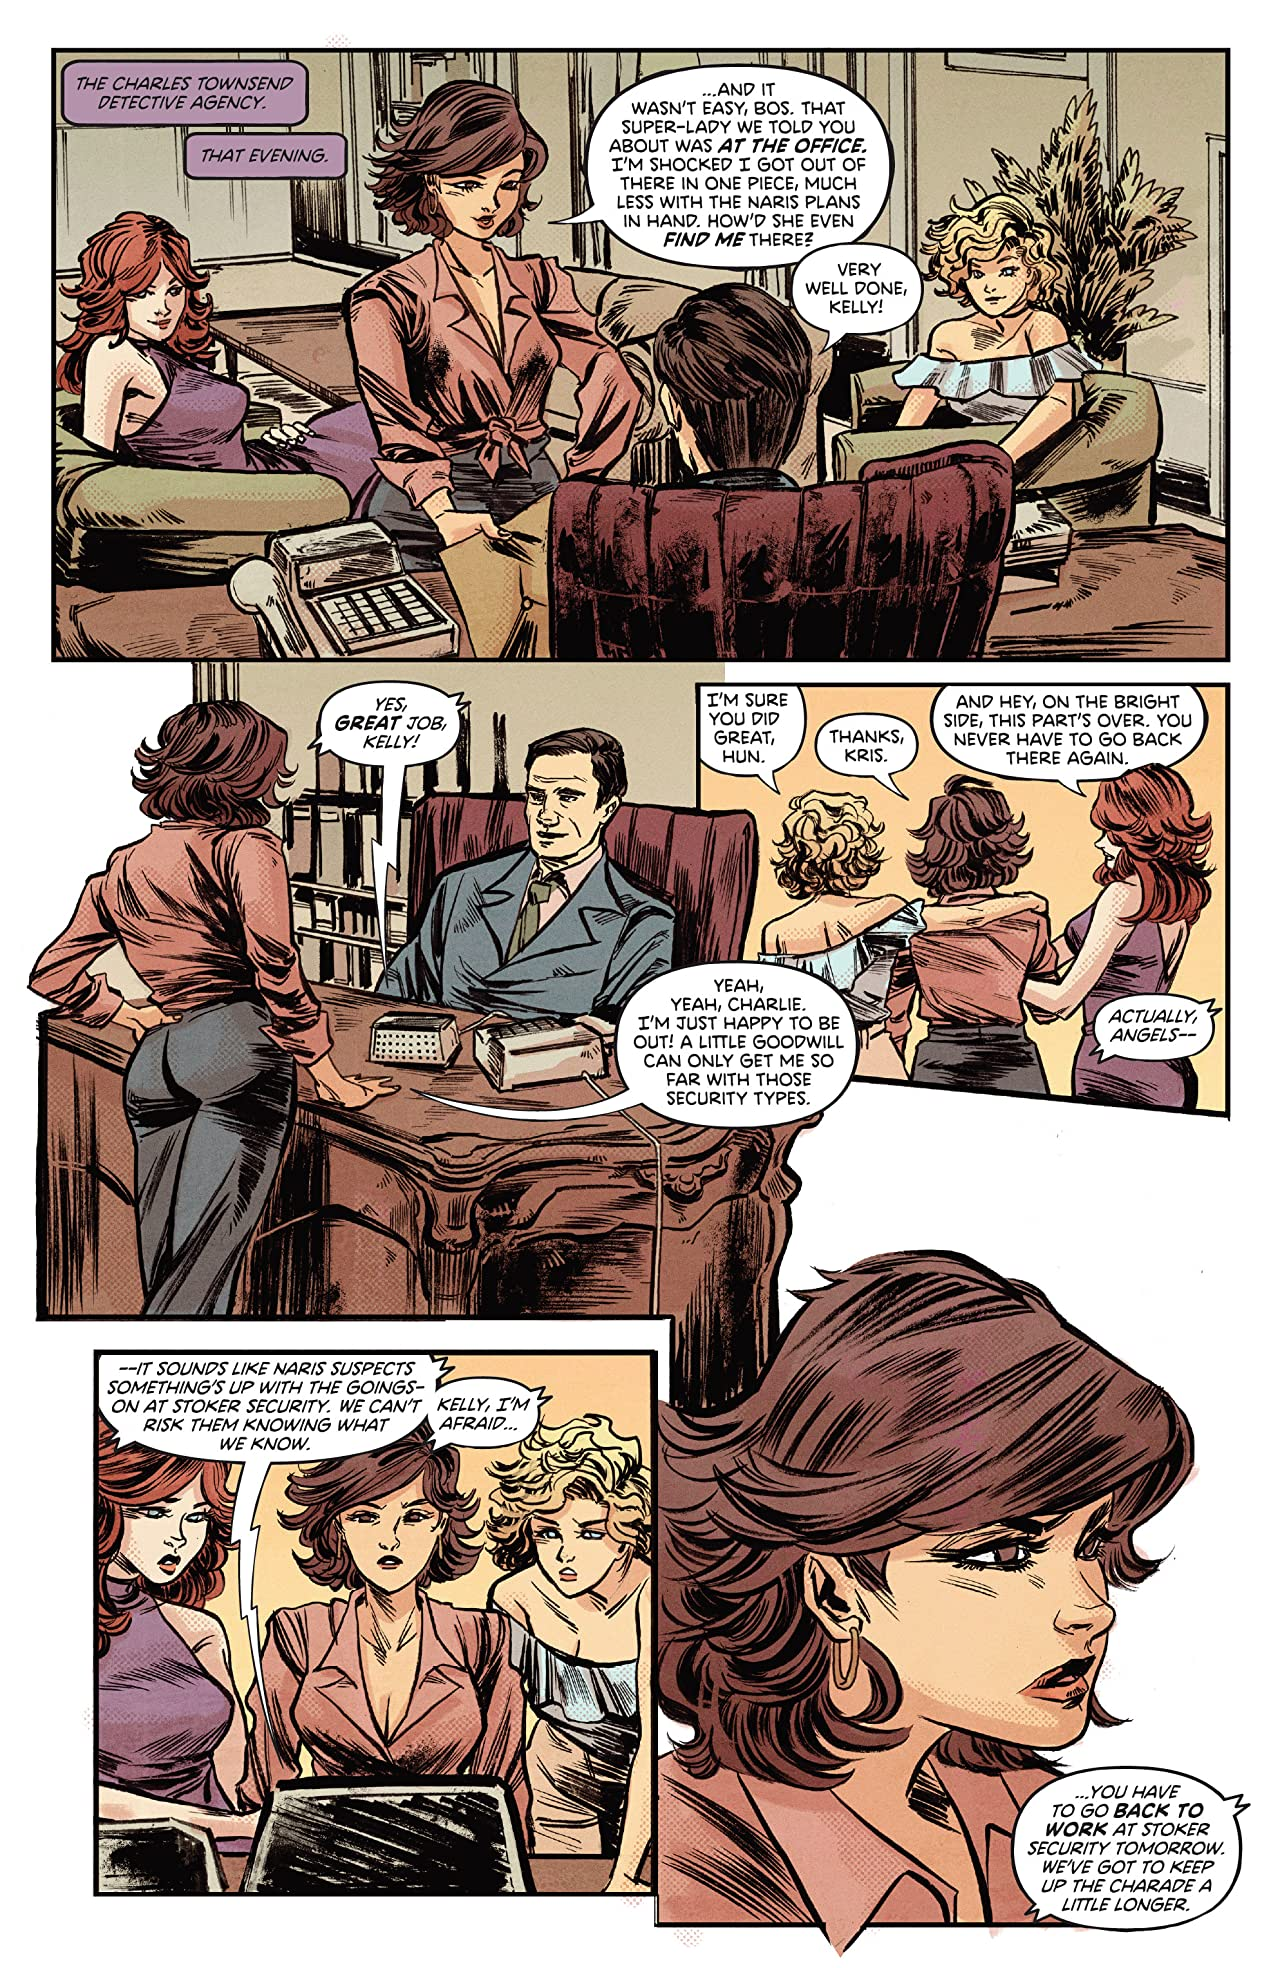 Charlie's Angels vs. The Bionic Woman No.3